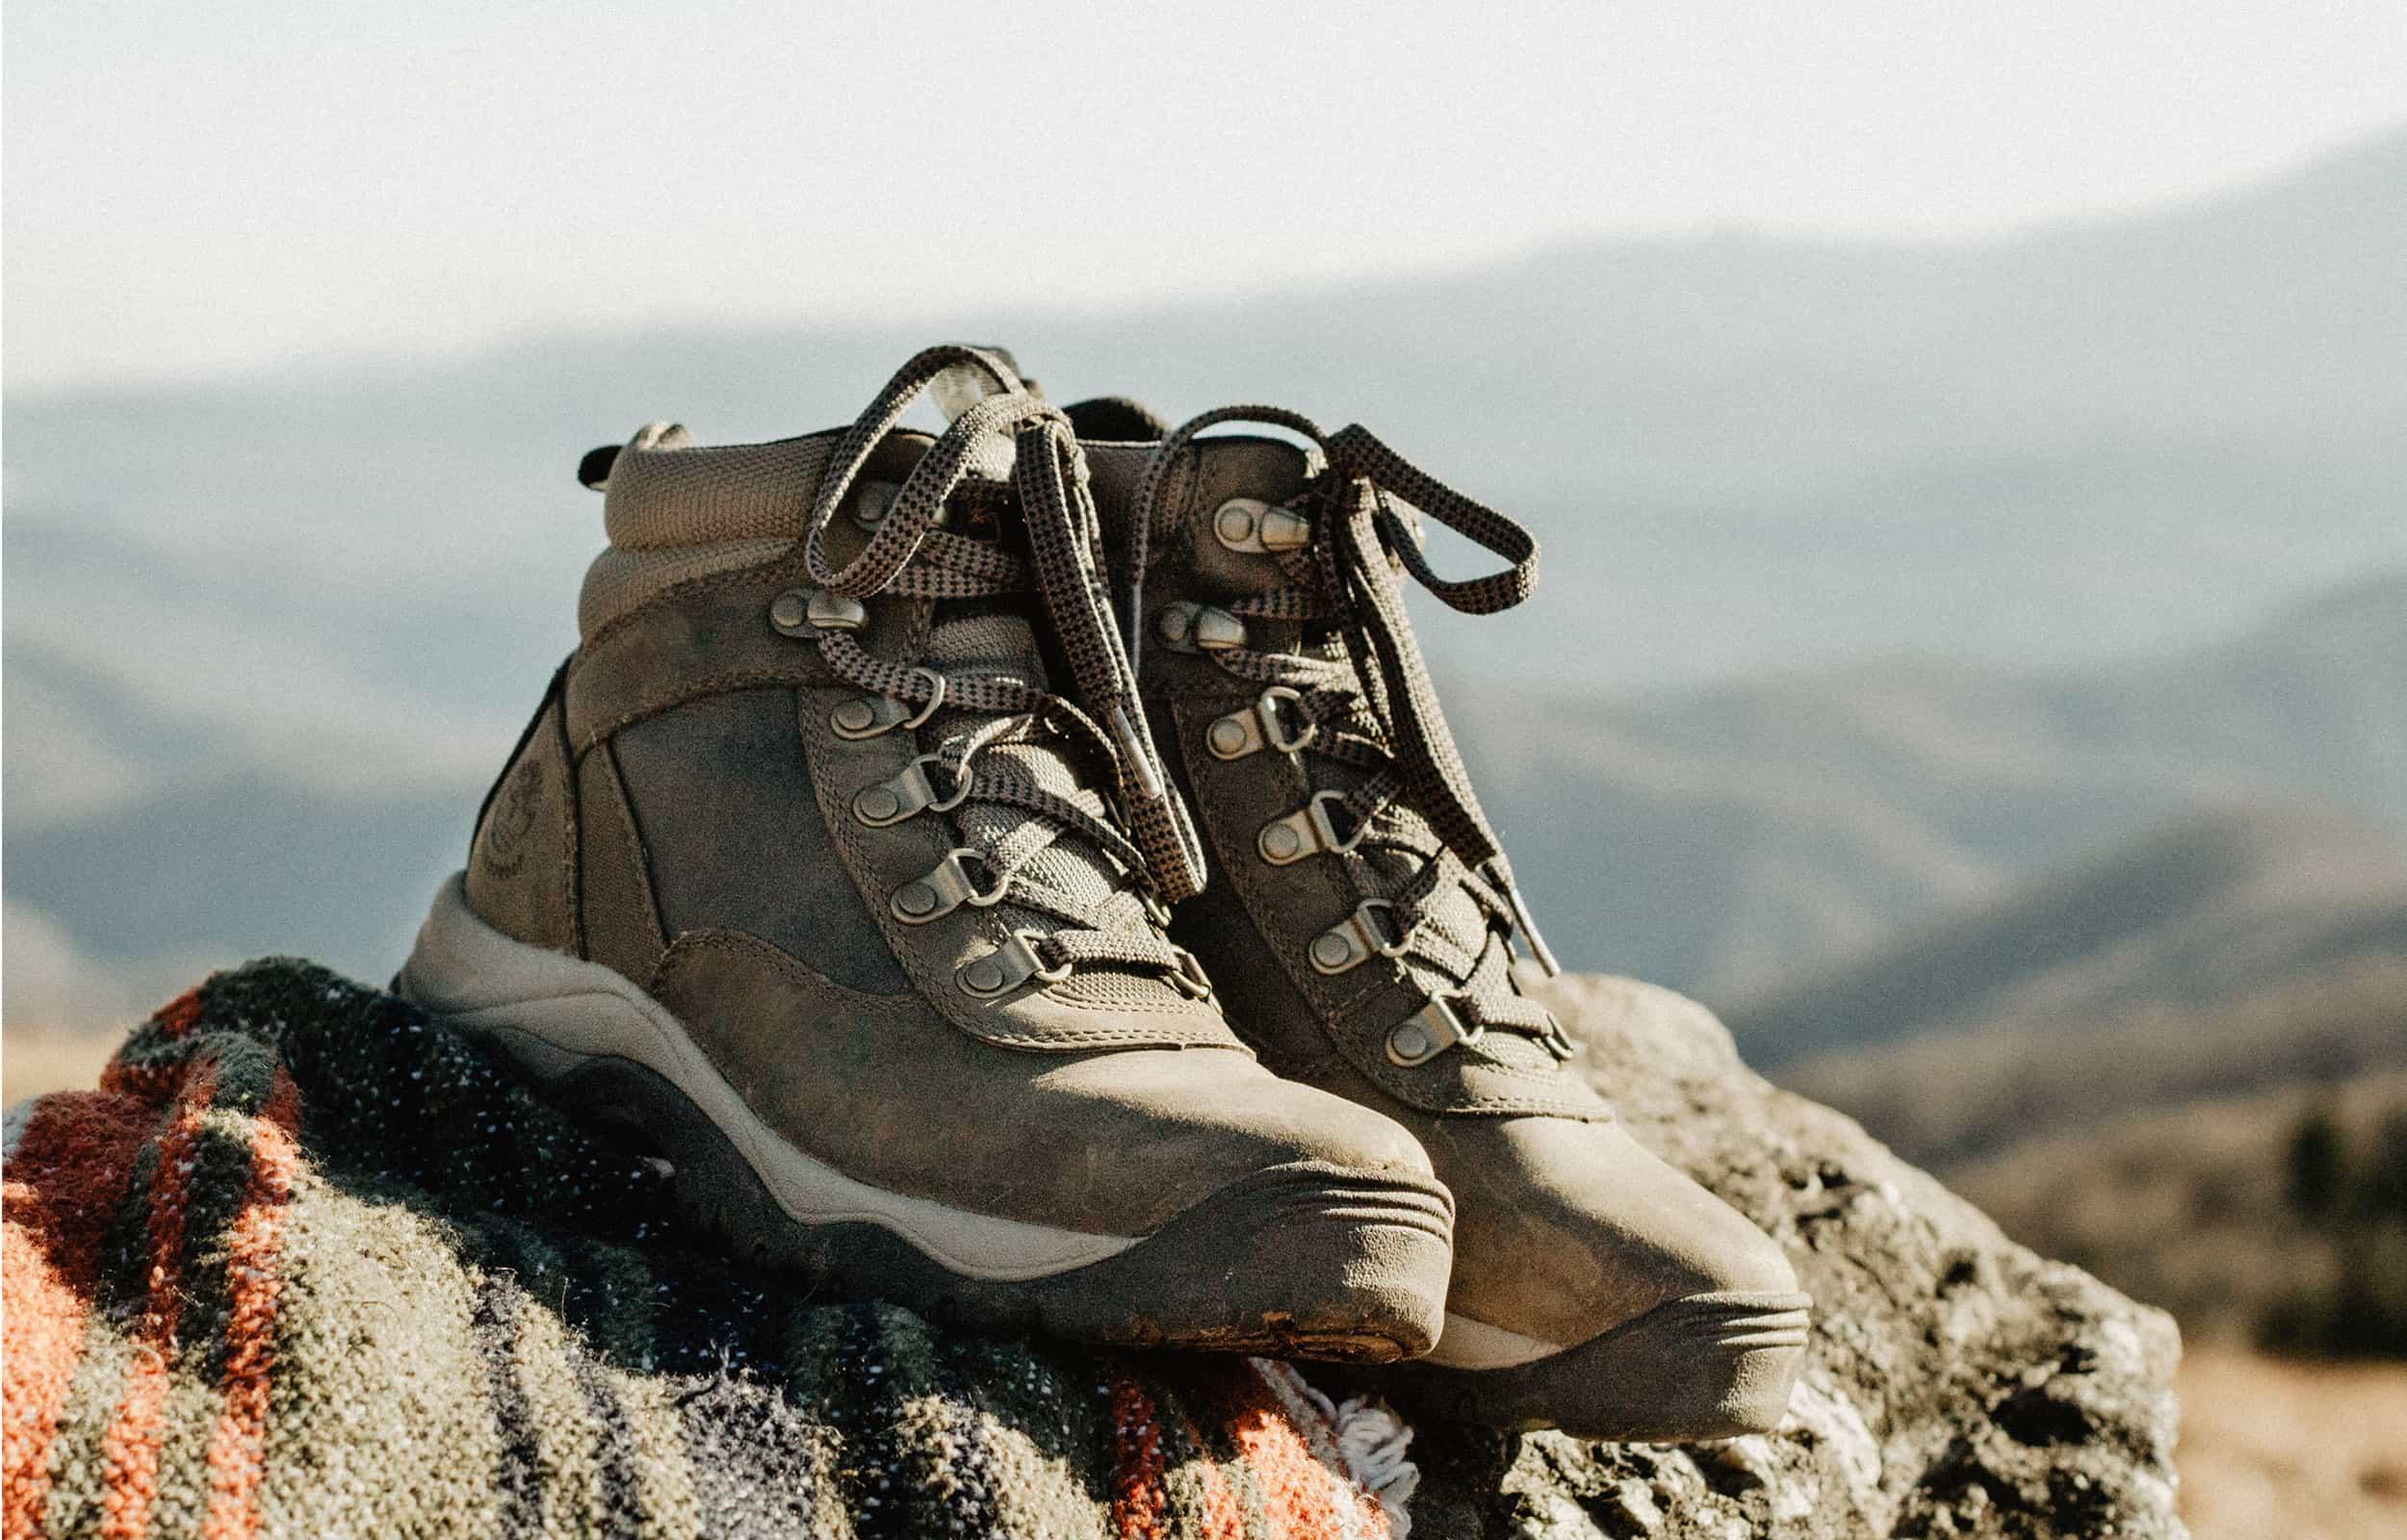 hiking shoes on big boulders